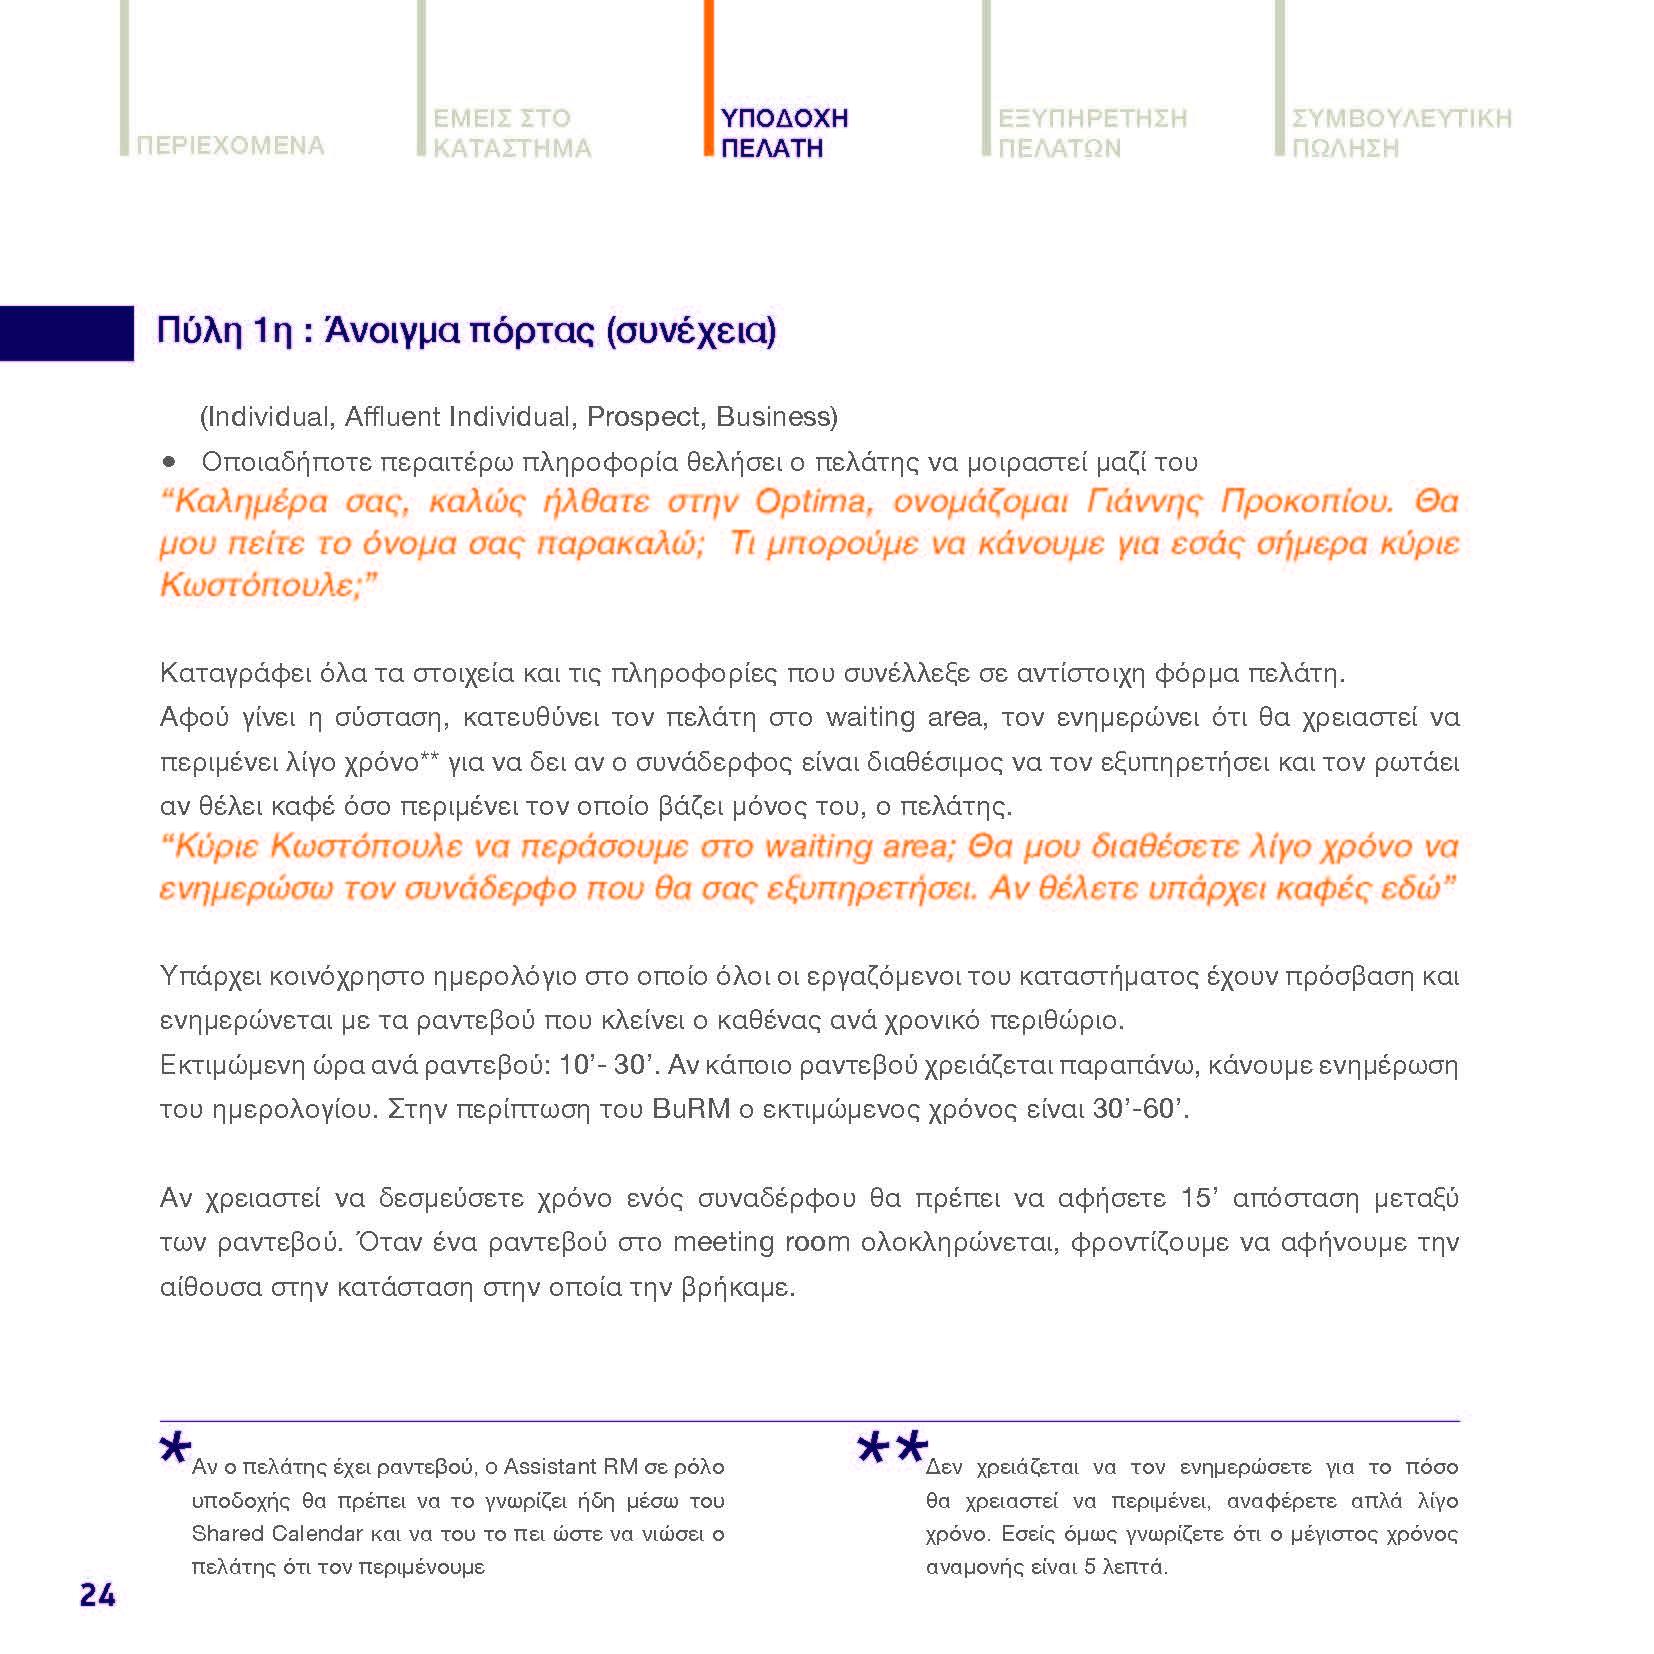 https://www.jib.gr/wp-content/uploads/2020/09/OPTIMA-BANK-BOOKLET-WEB_Page_024.jpg